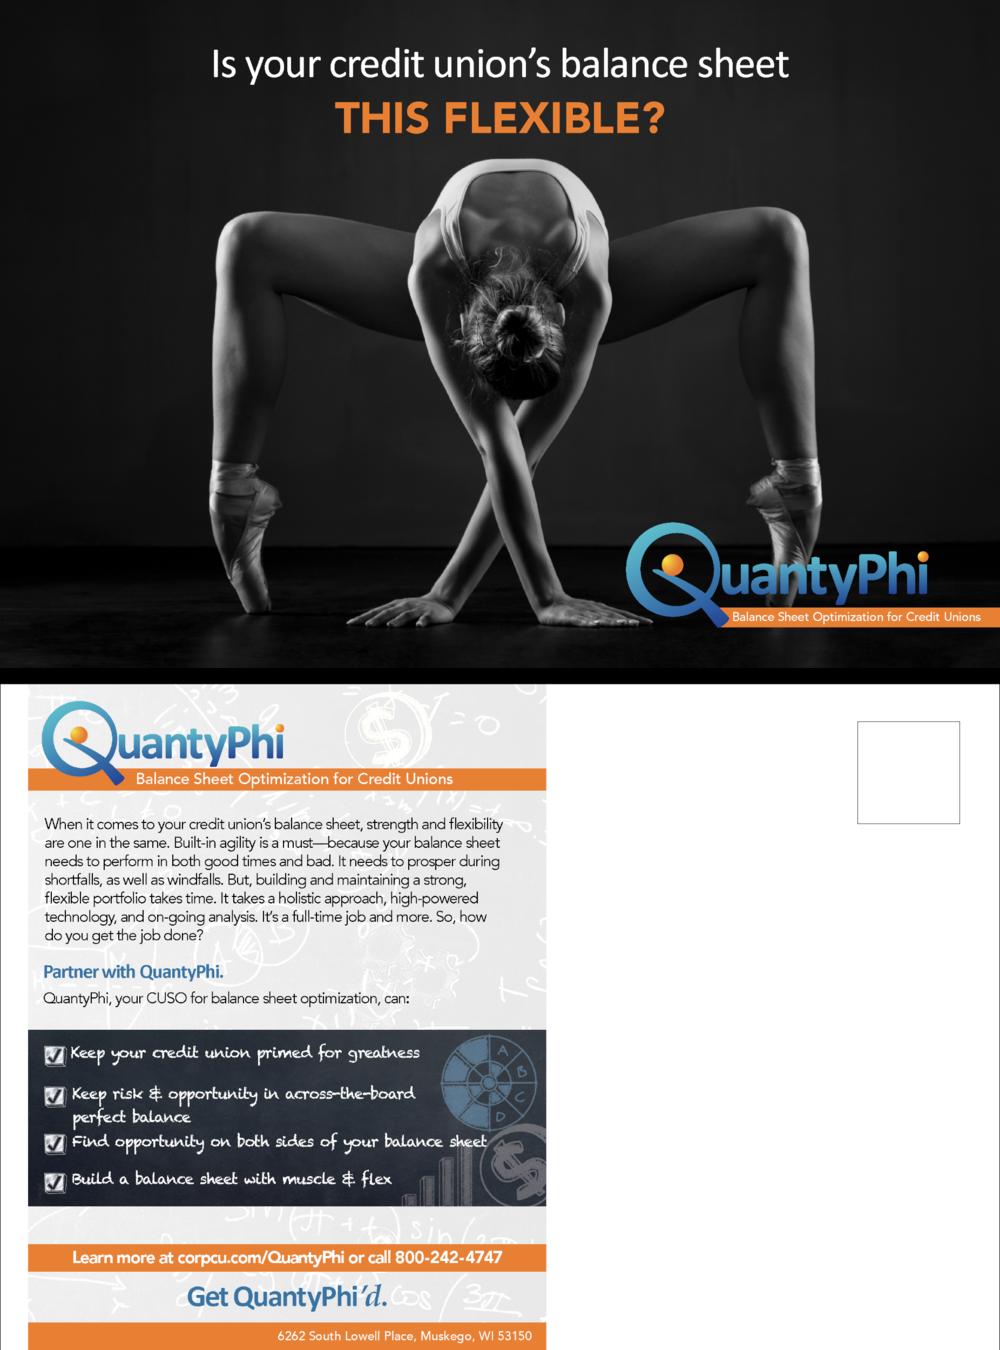 QuantyPhi-postcards-web-bal.png